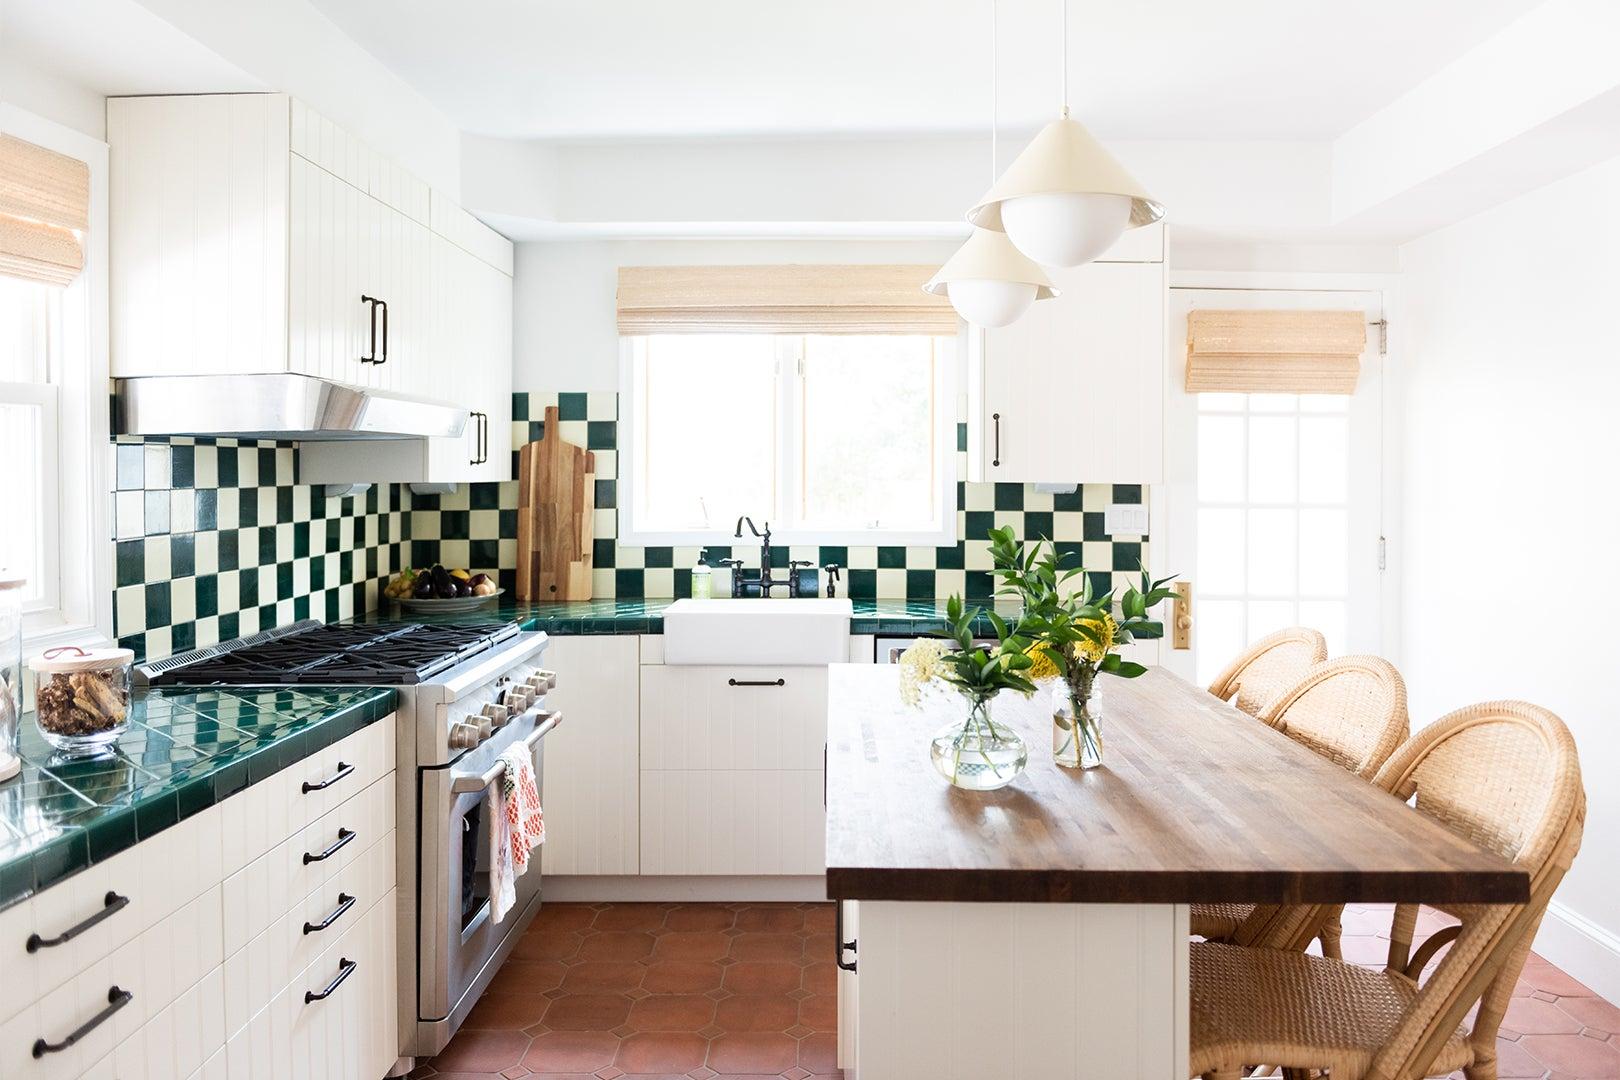 Green and white checkered backsplash